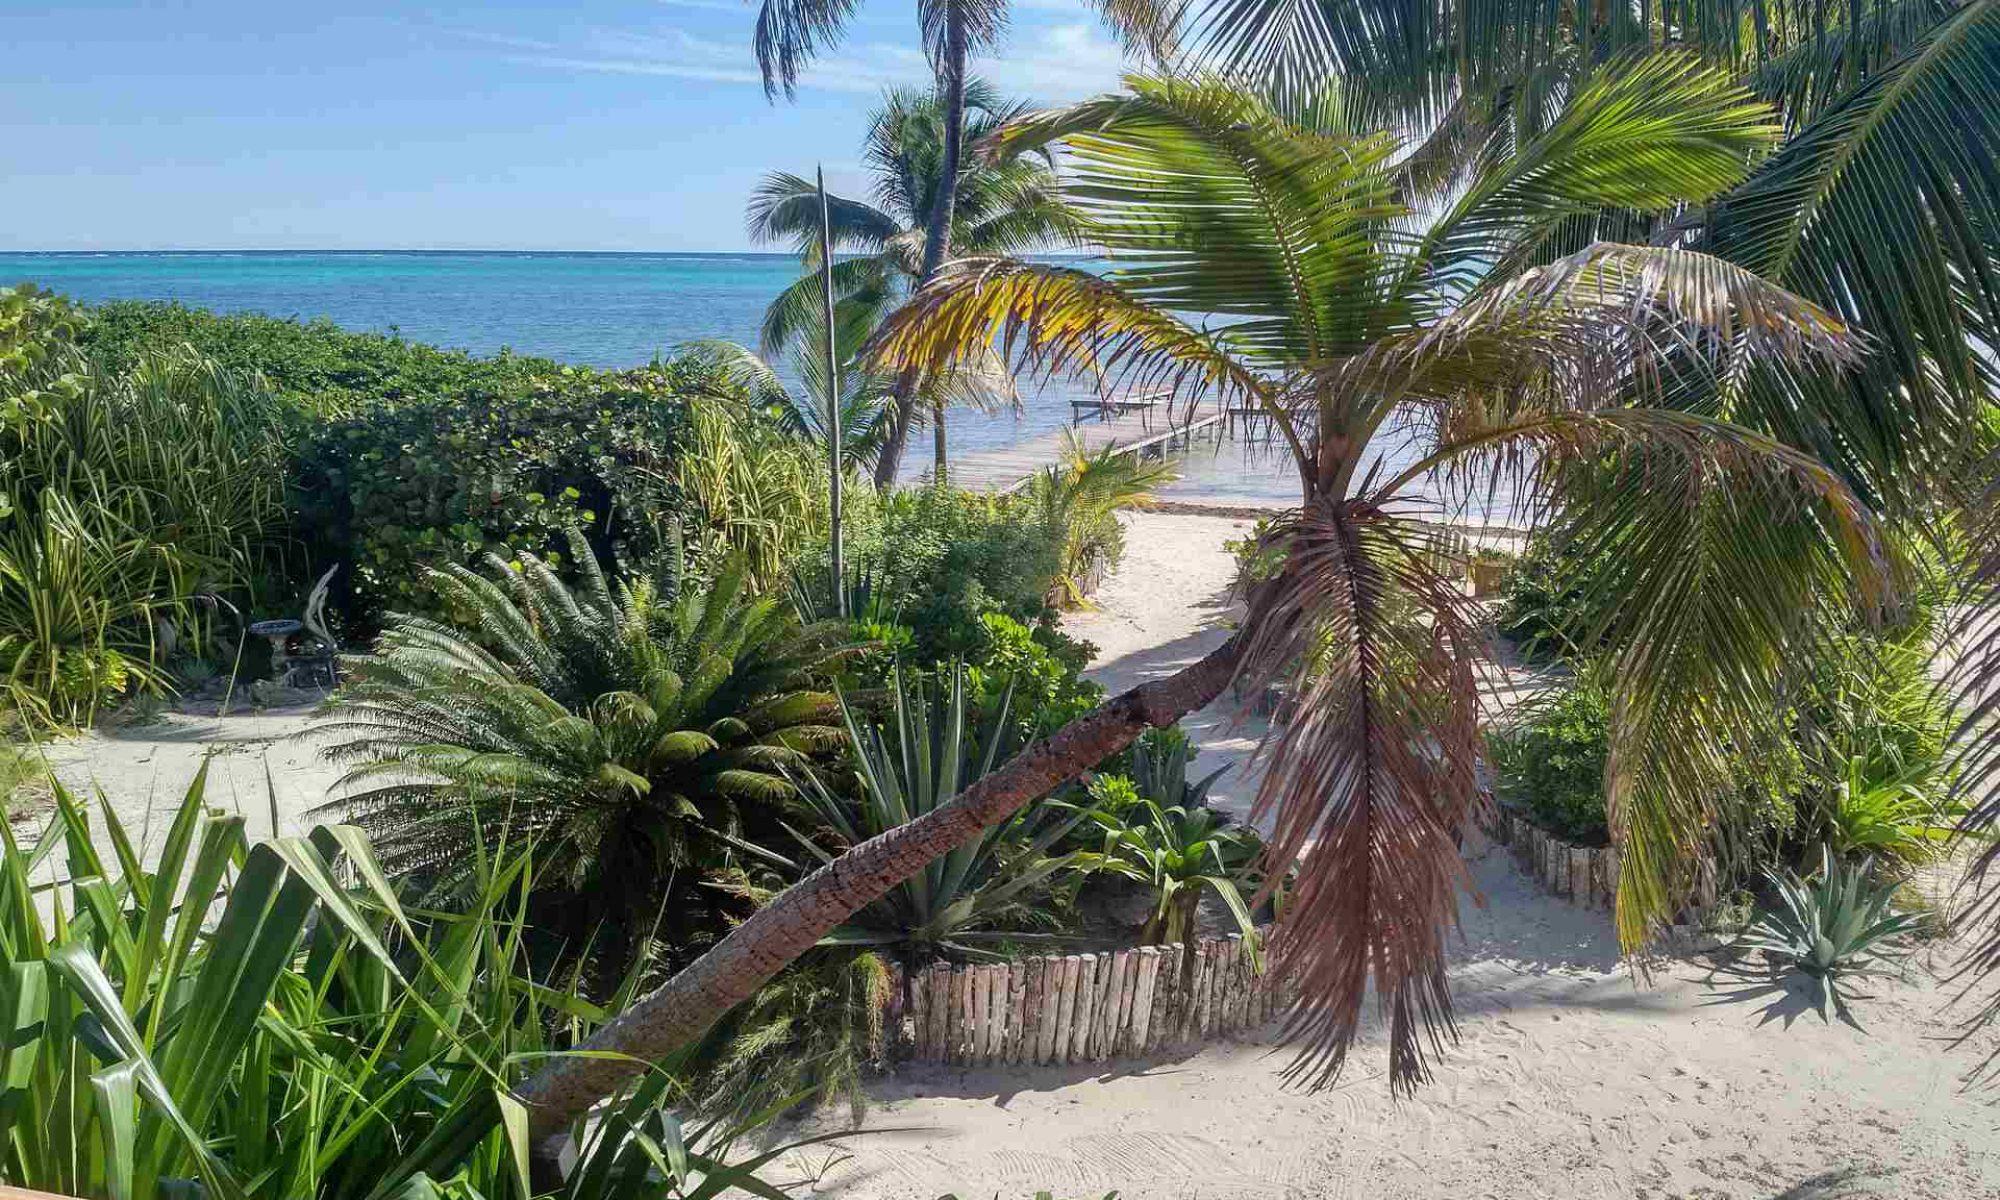 Coastal Breezes in Belize